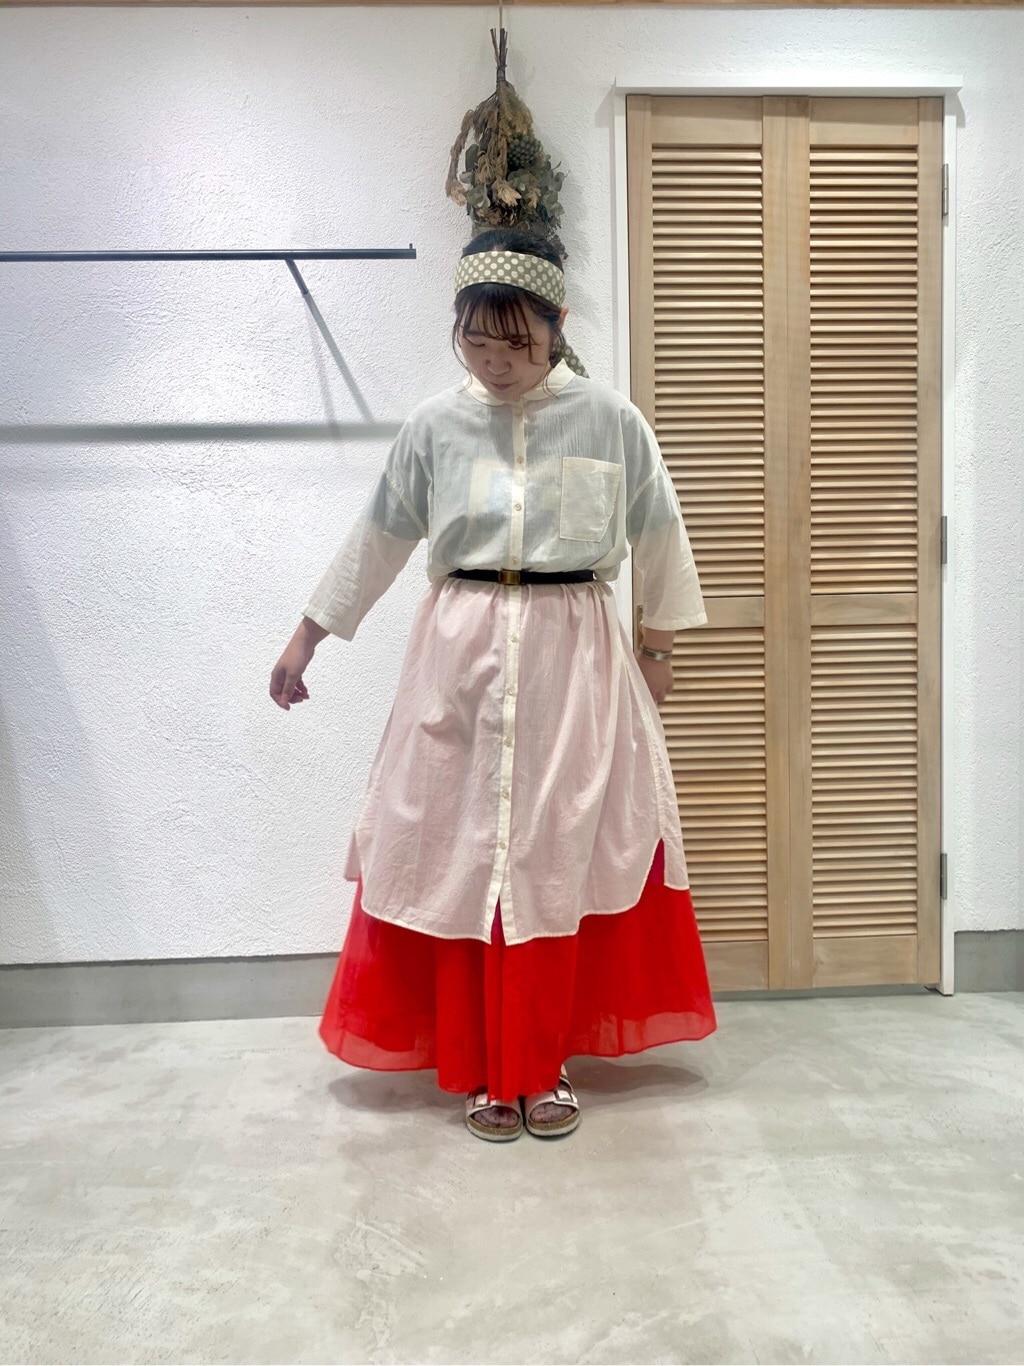 chambre de charme 横浜ジョイナス 身長:155cm 2020.07.24